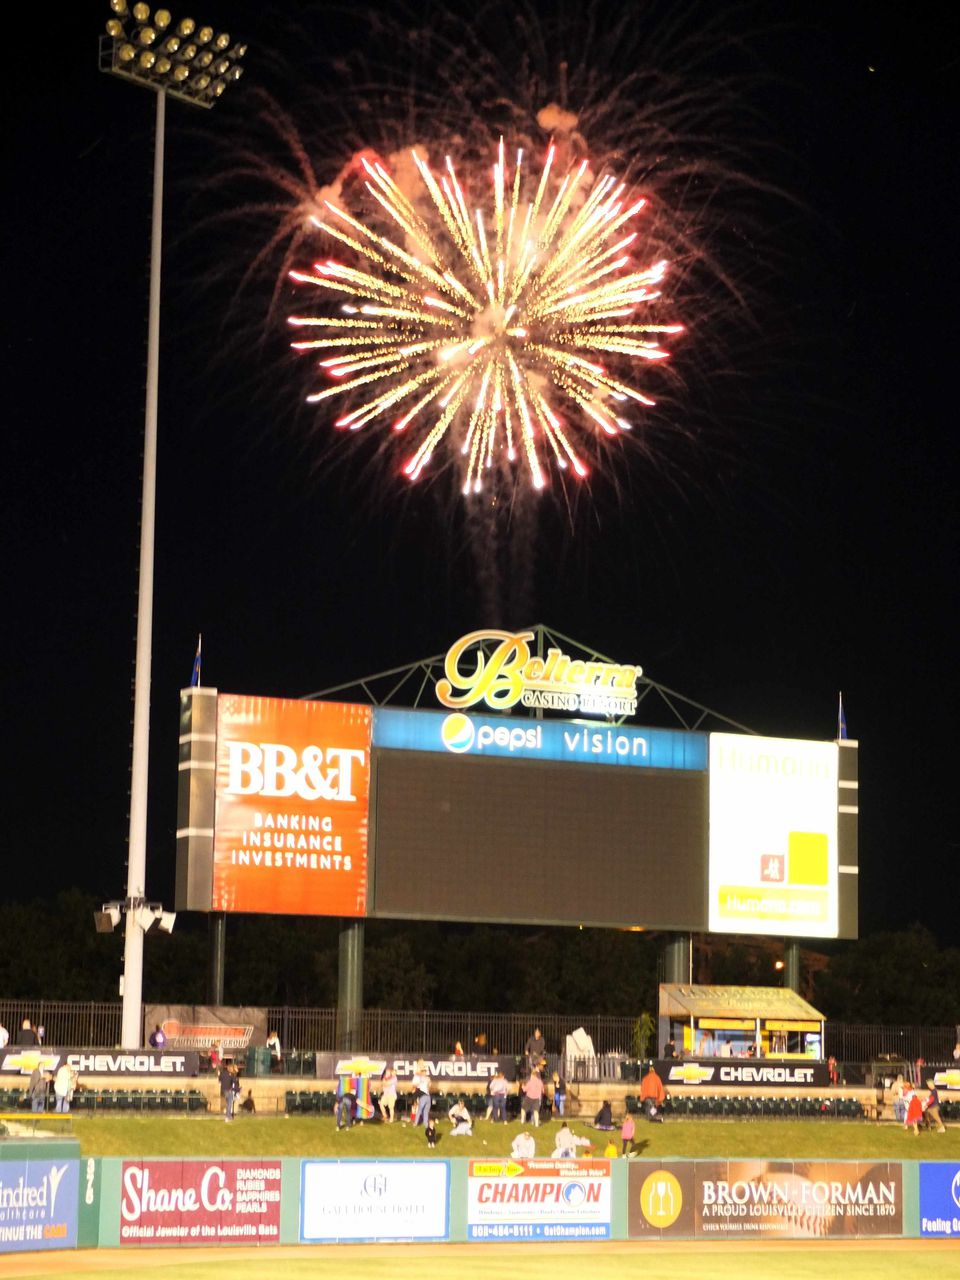 Fireworks at Slugger Field